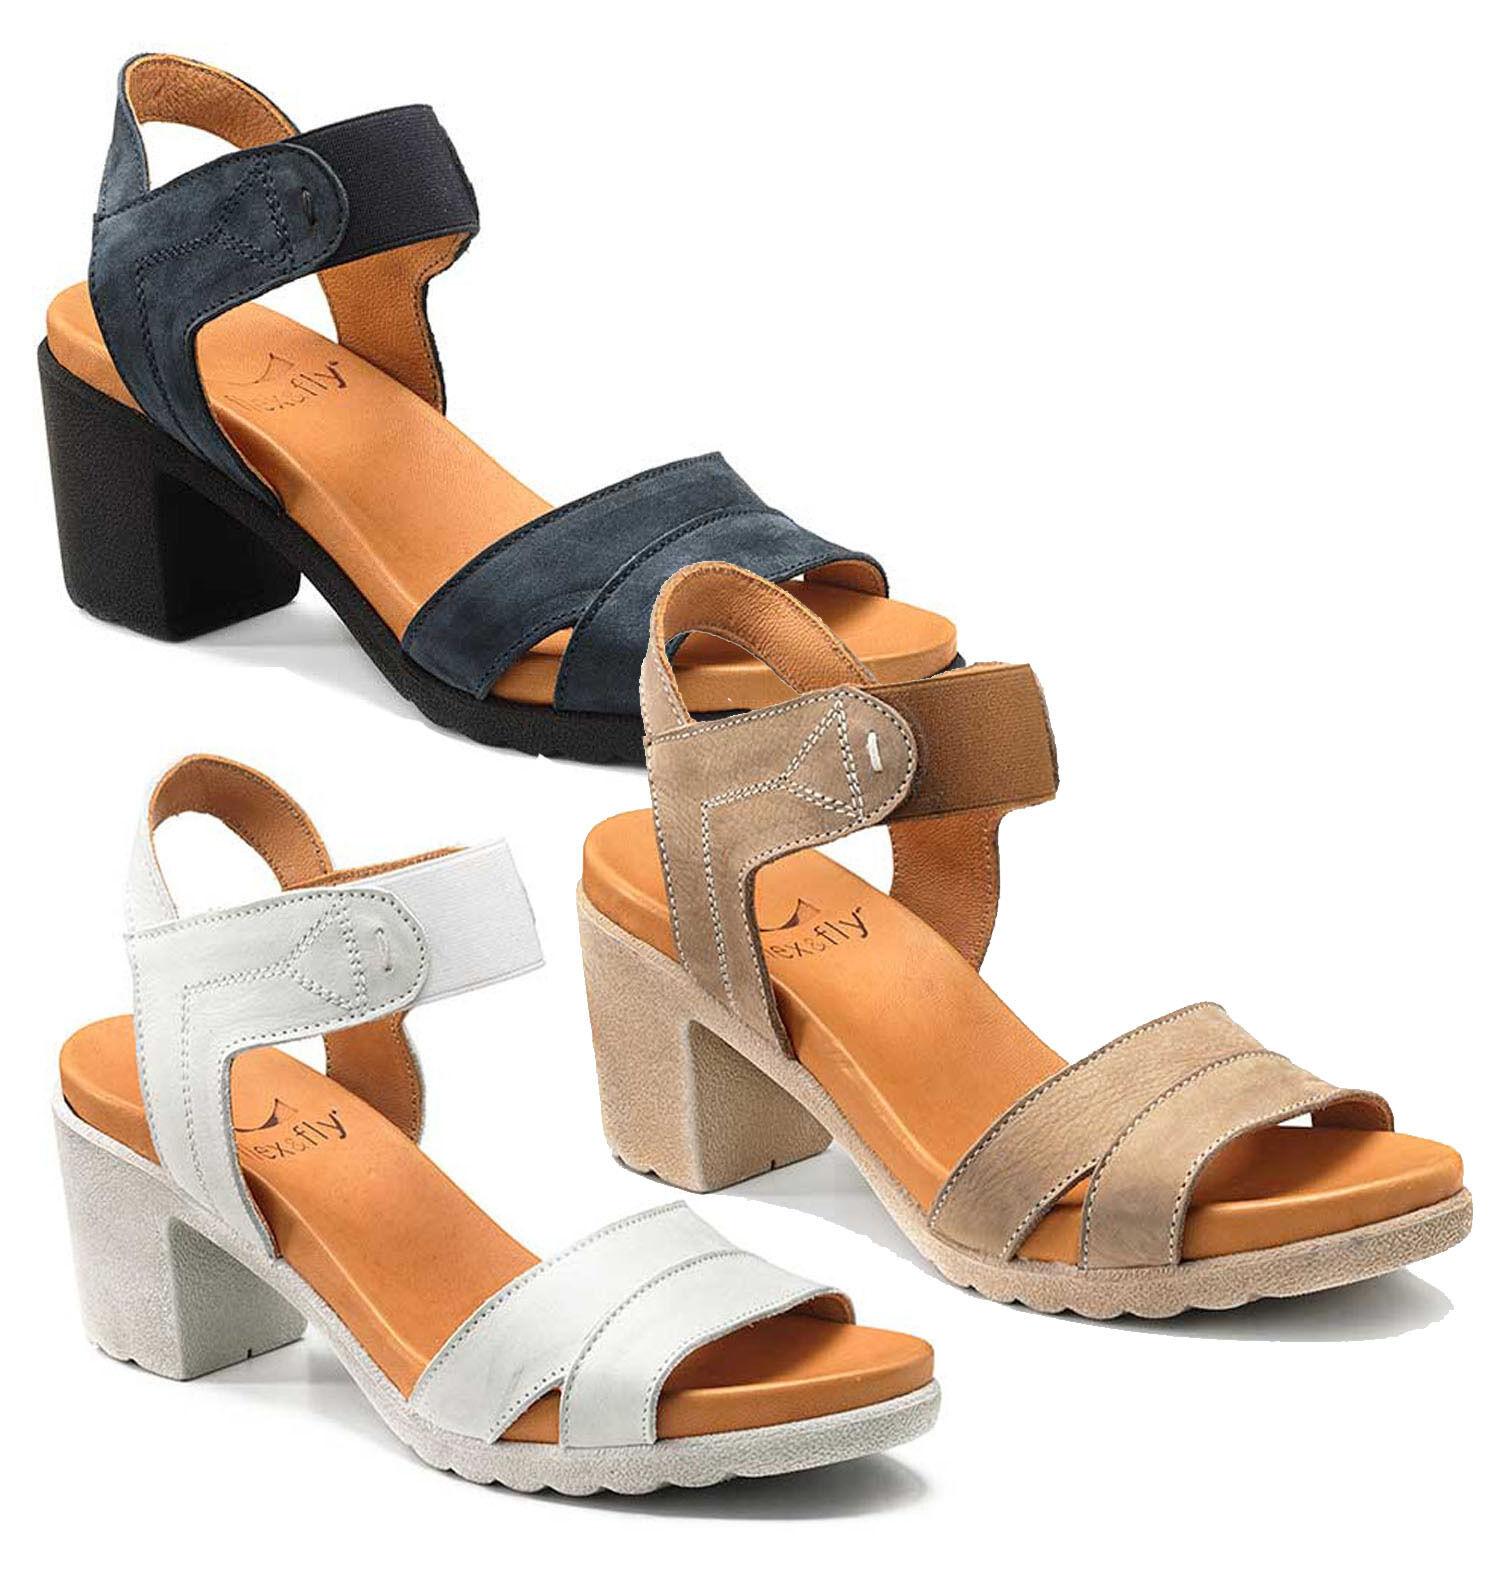 Keys 5291 Schuhe Damen Sandalen Geöffnet Hoch Absatz Plateau Nubuk Leder Gämse